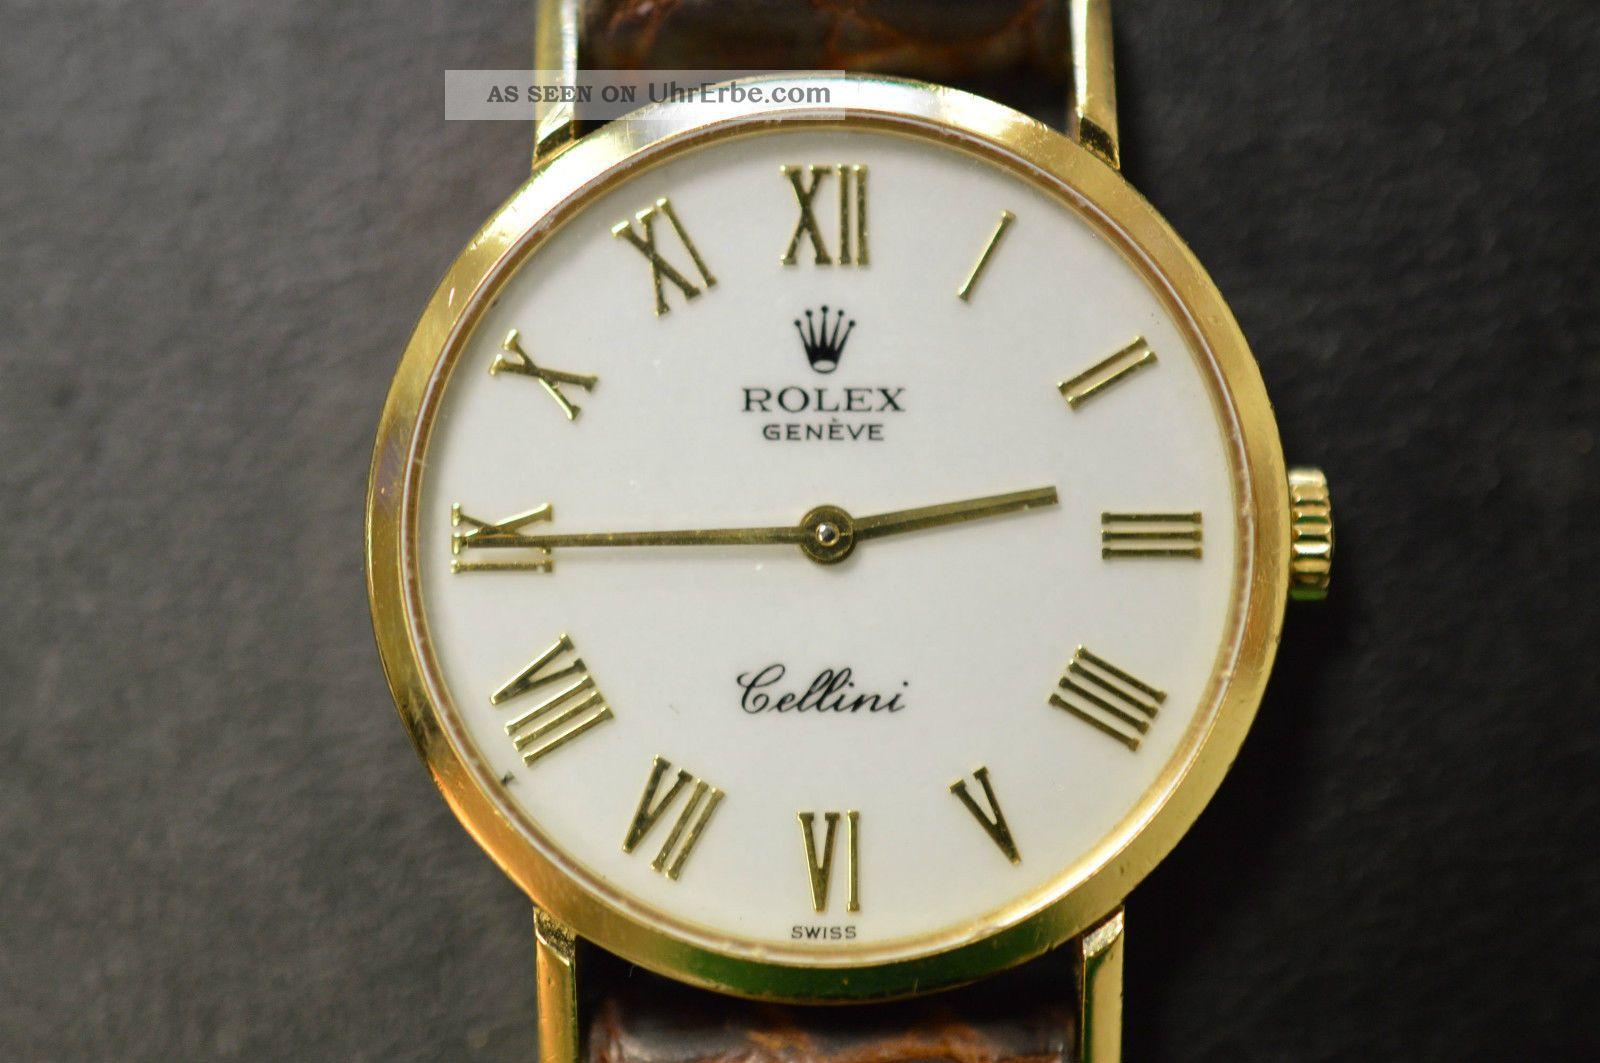 Rolex Cellini Ref.  4109 Handaufzug 750er Gelbgold 18k Vintage Armbanduhren Bild